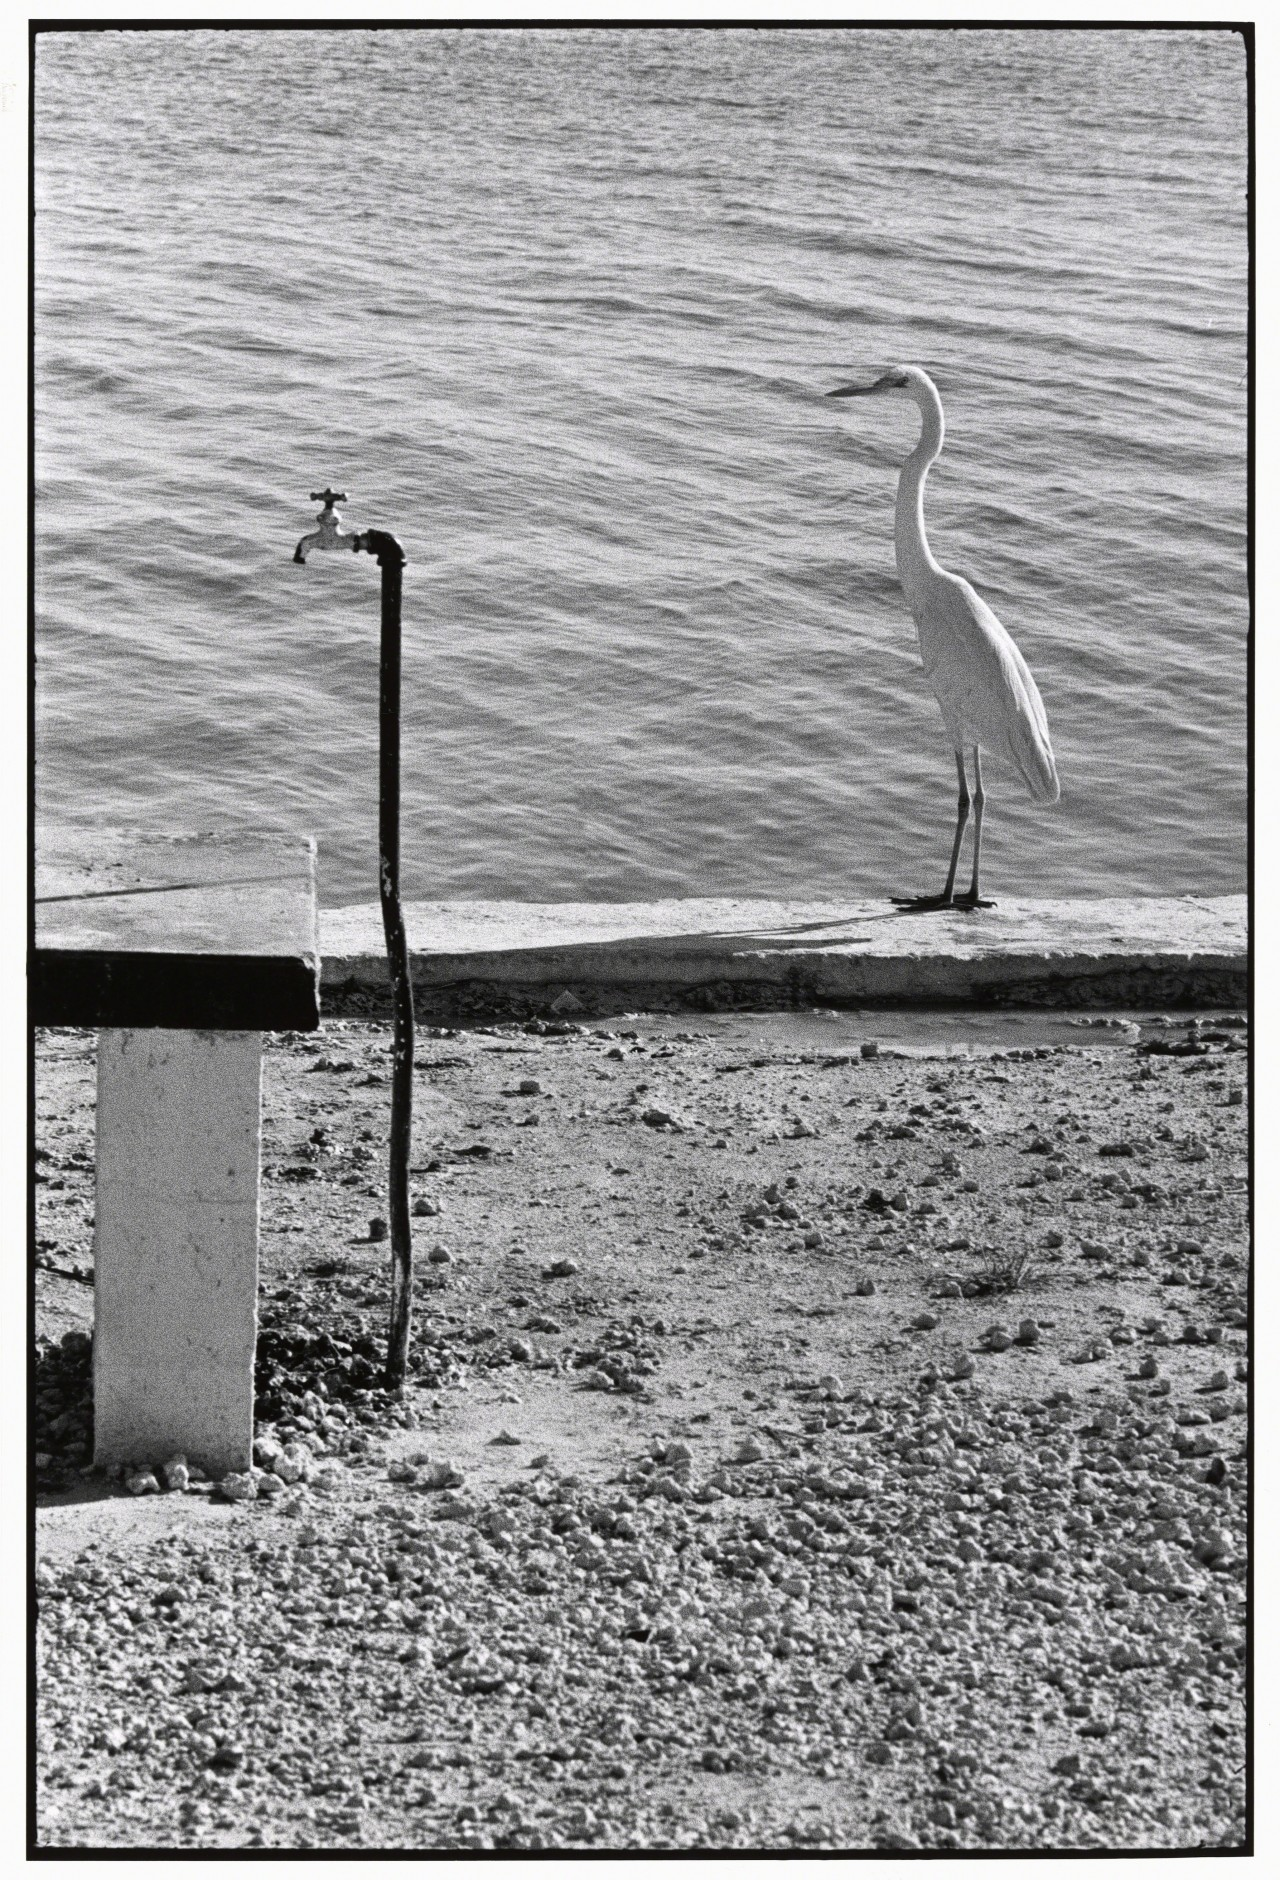 Флорида-Кис, 1968. Автор Эллиотт Эрвитт